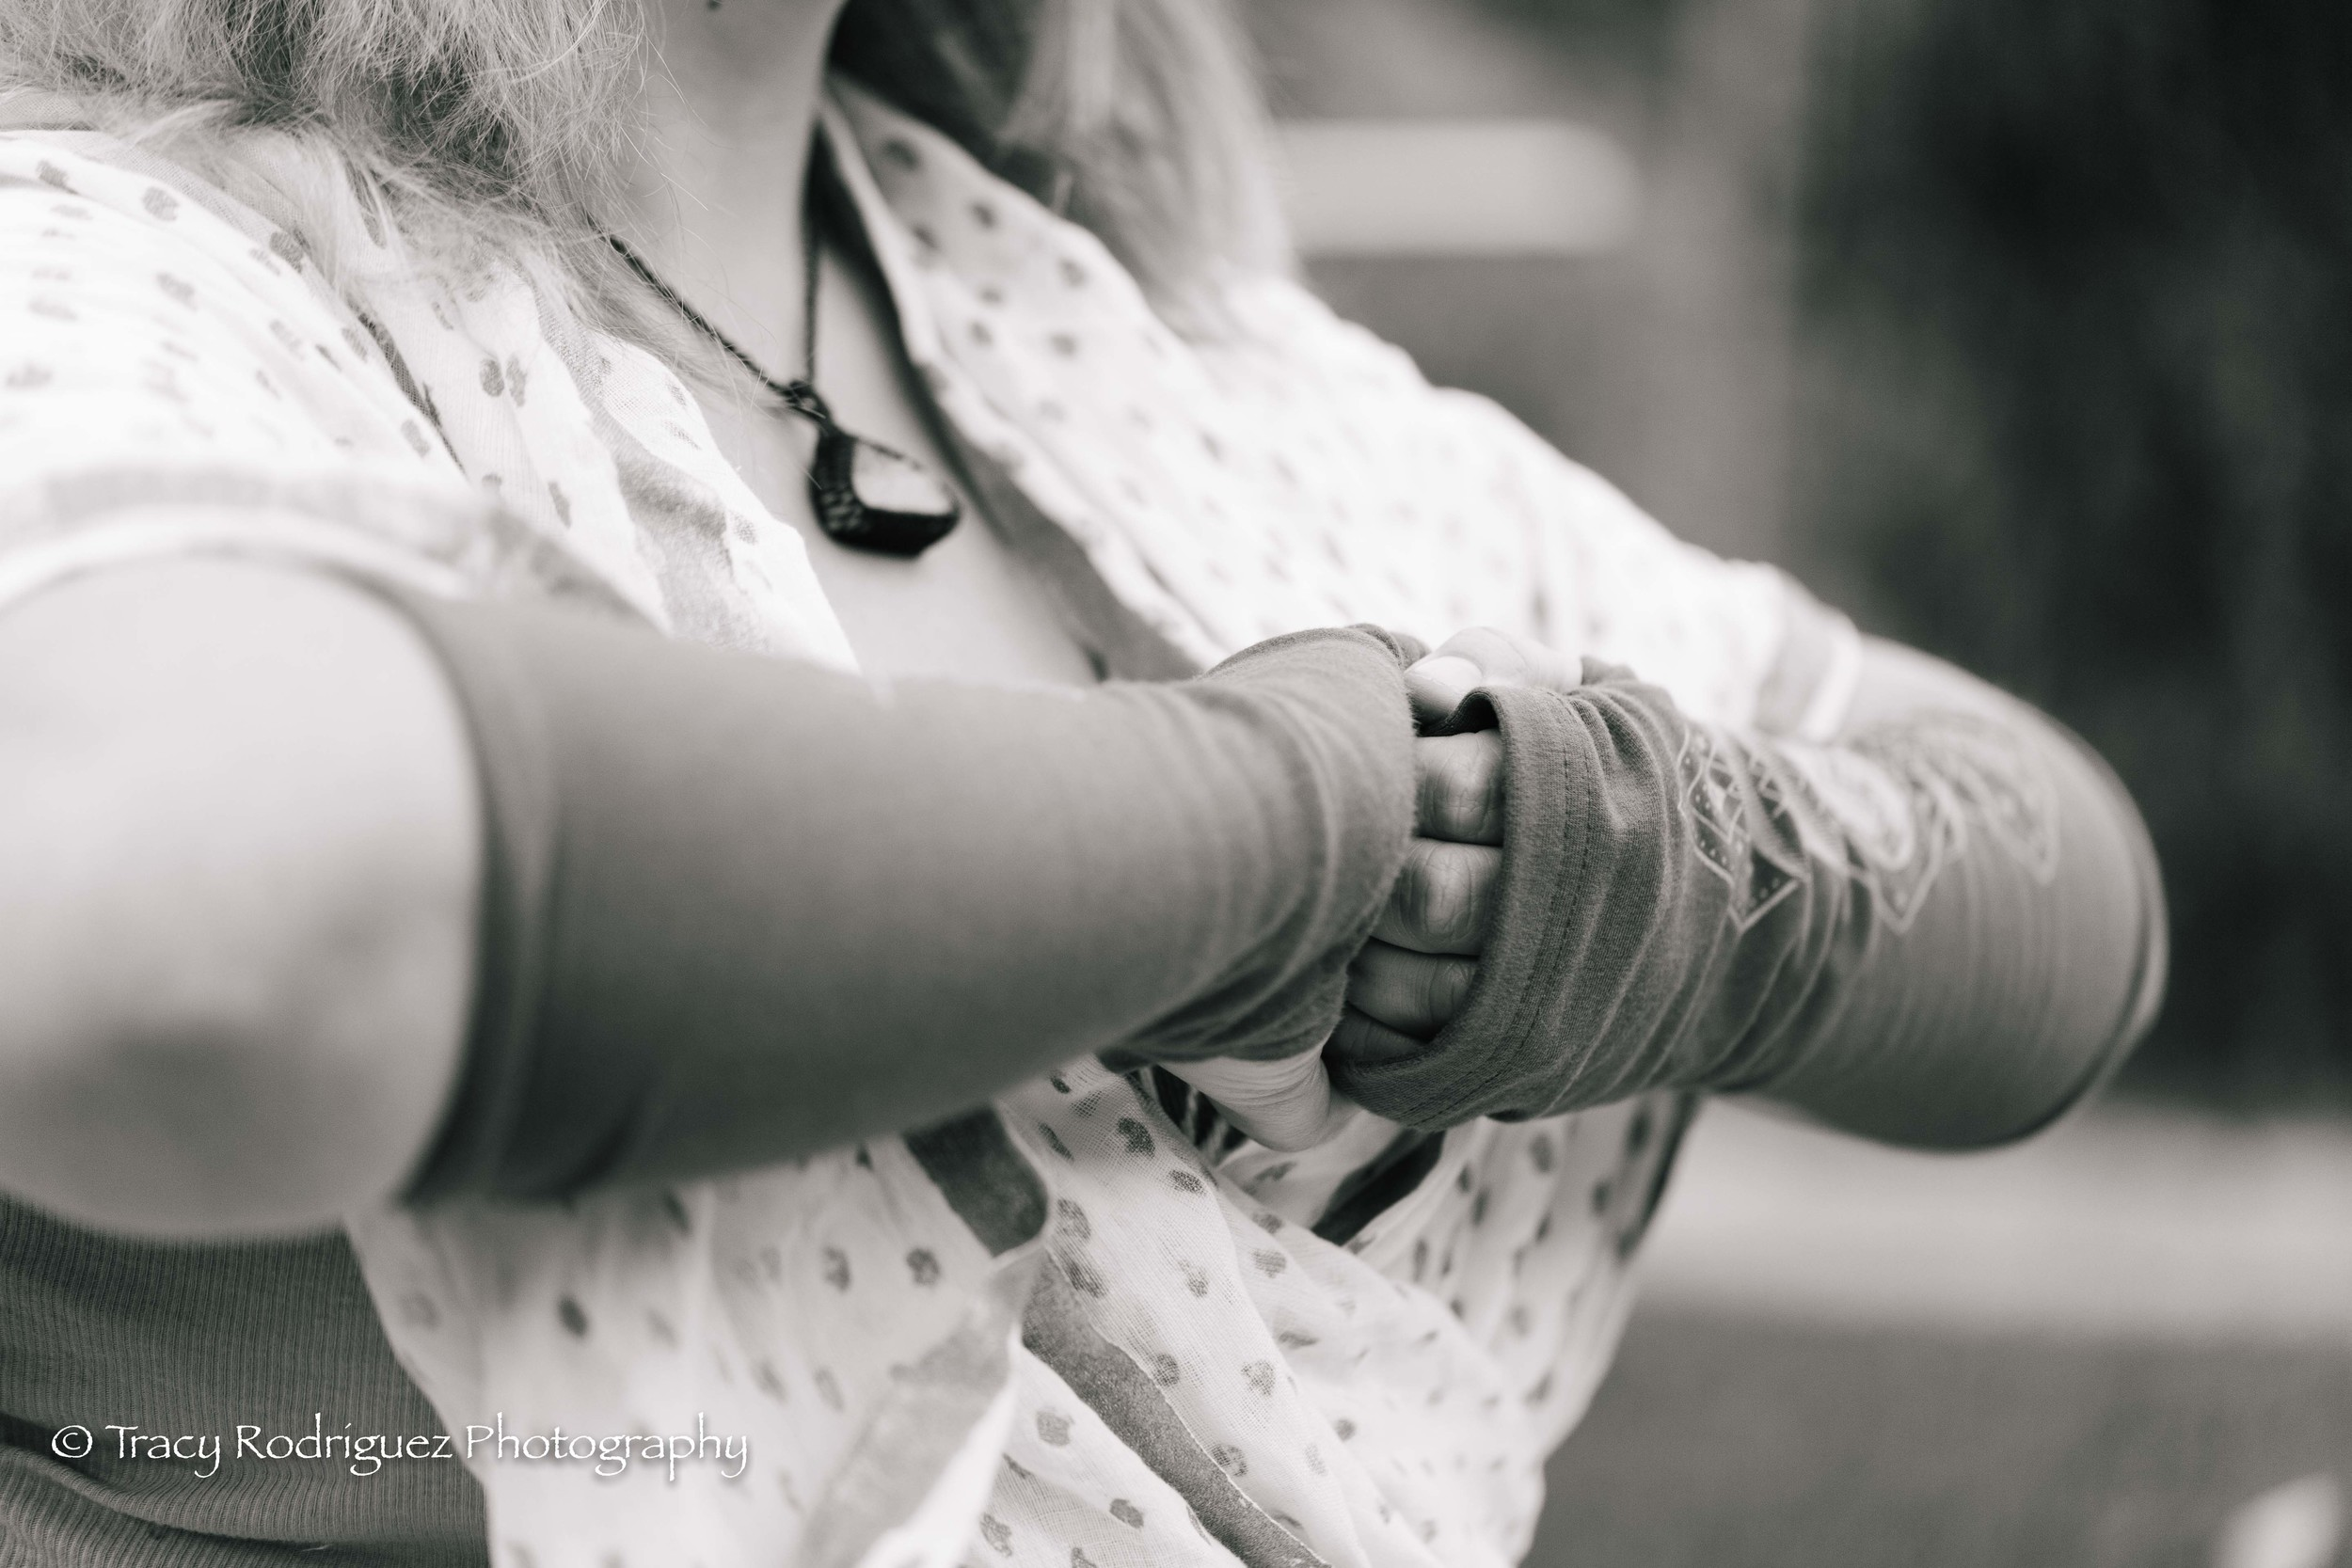 TracyRodriguezPhotography-13.jpg